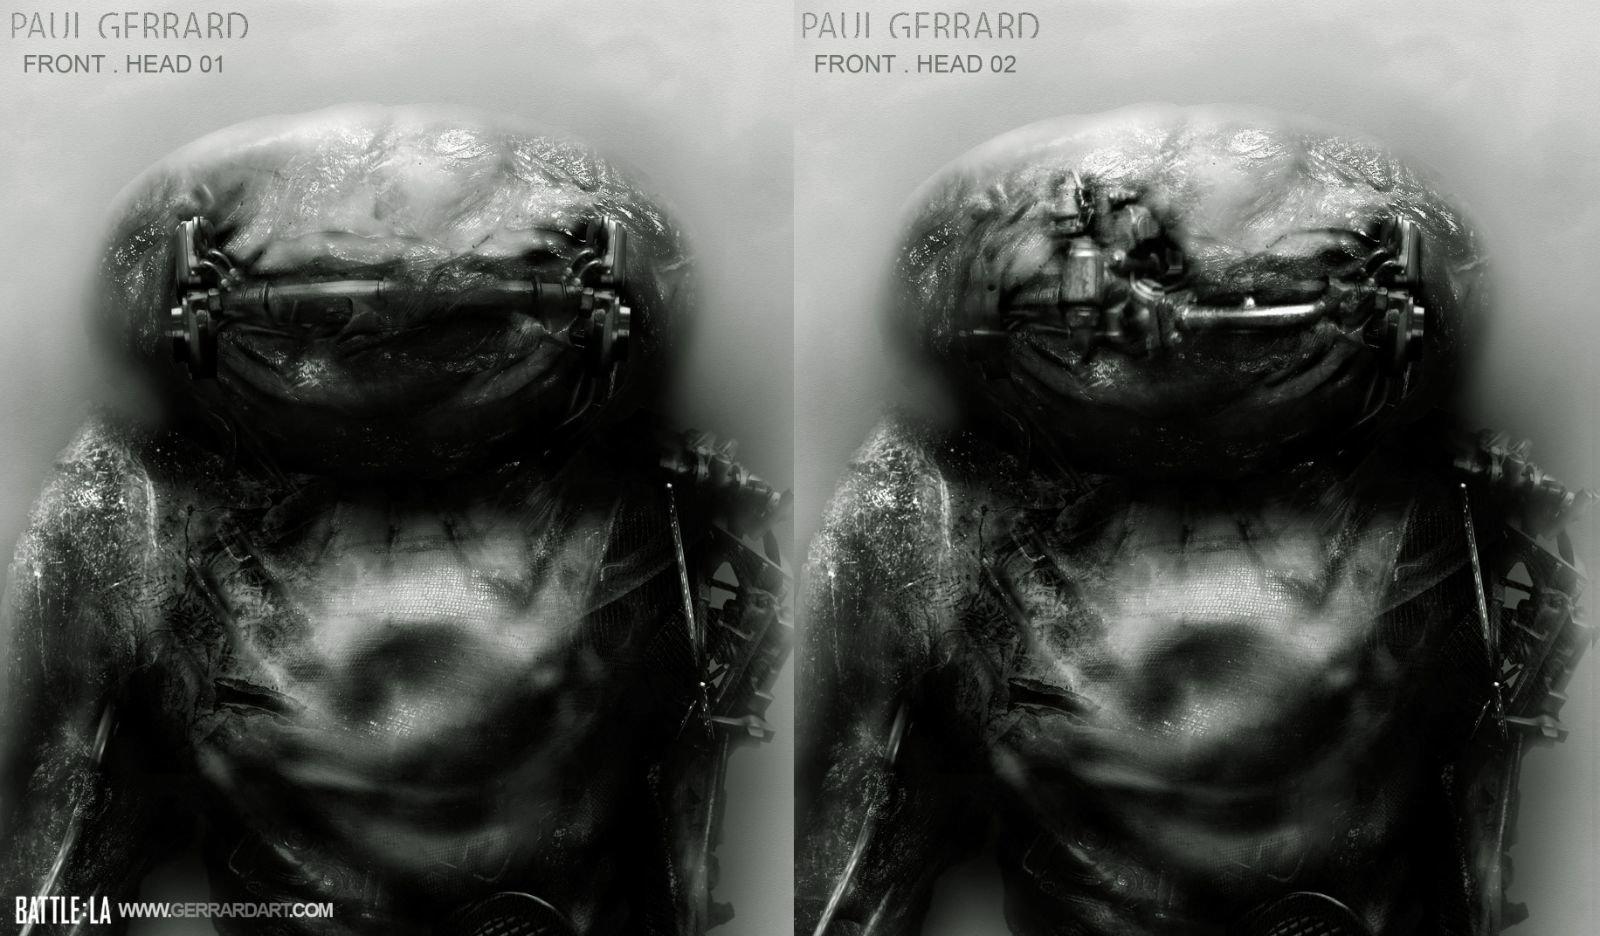 Paul gerrard g1 124 front head 01